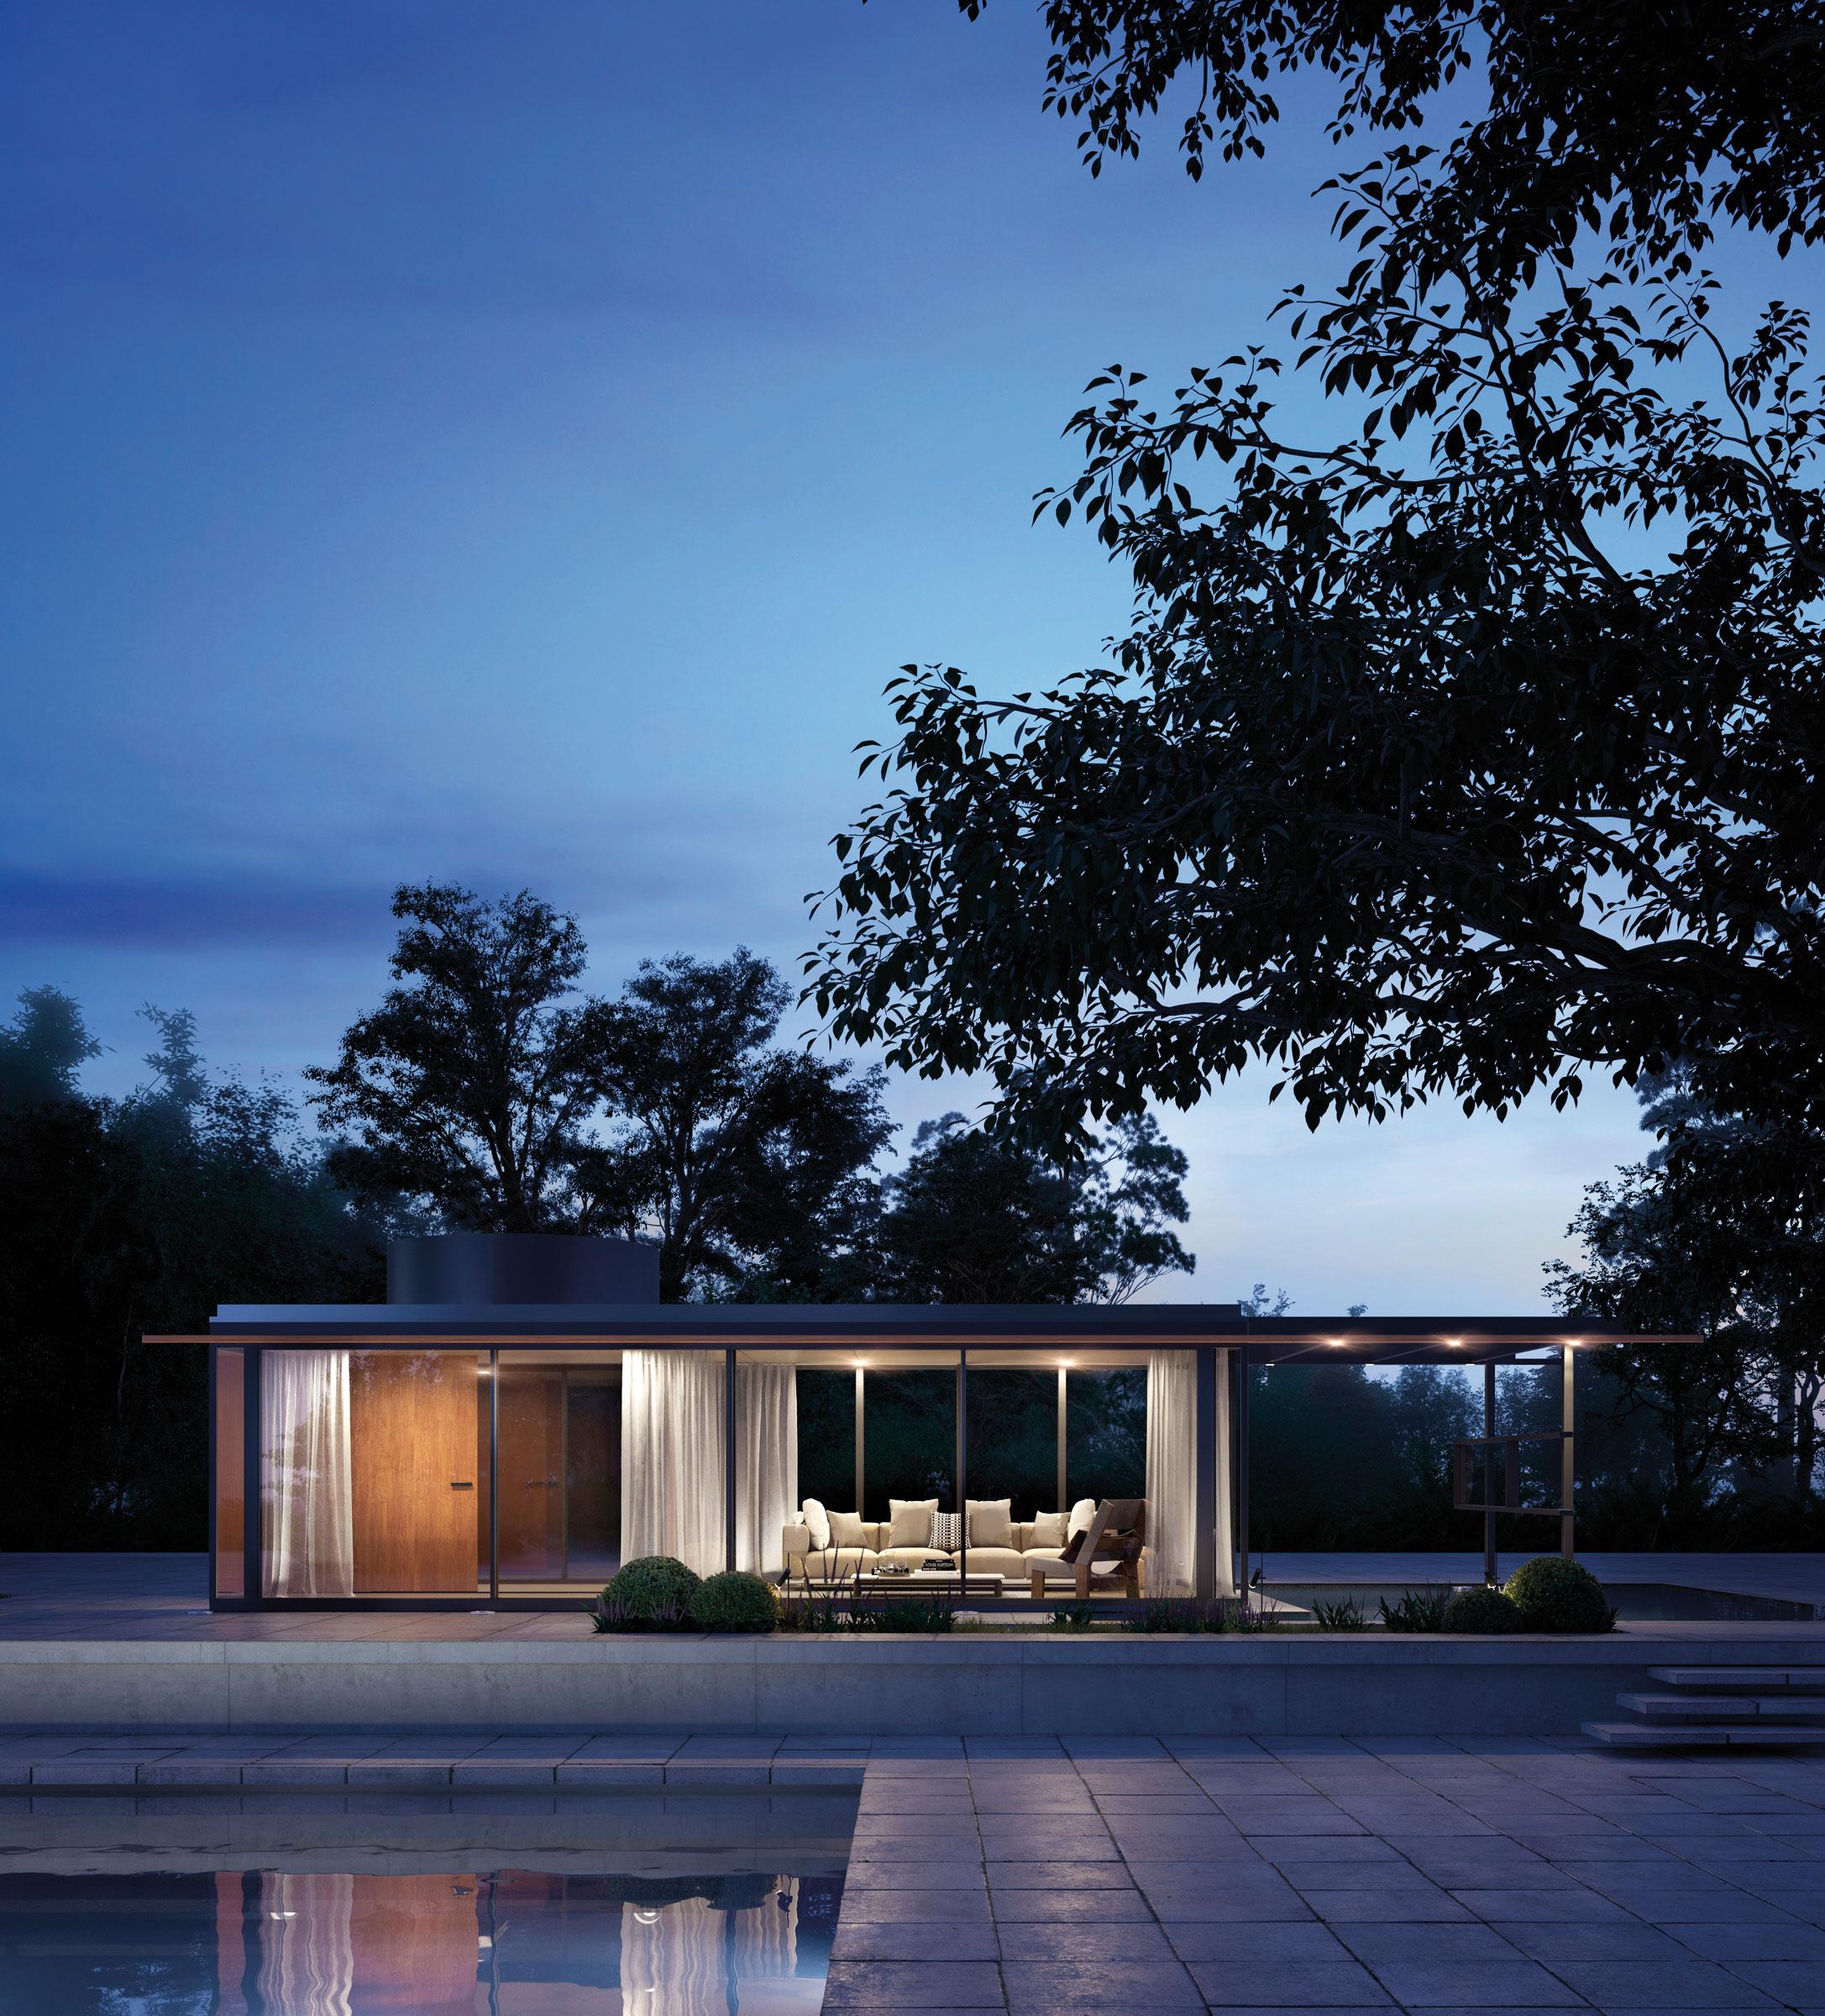 hauser-design-kettal-pavillon-H-am-pool